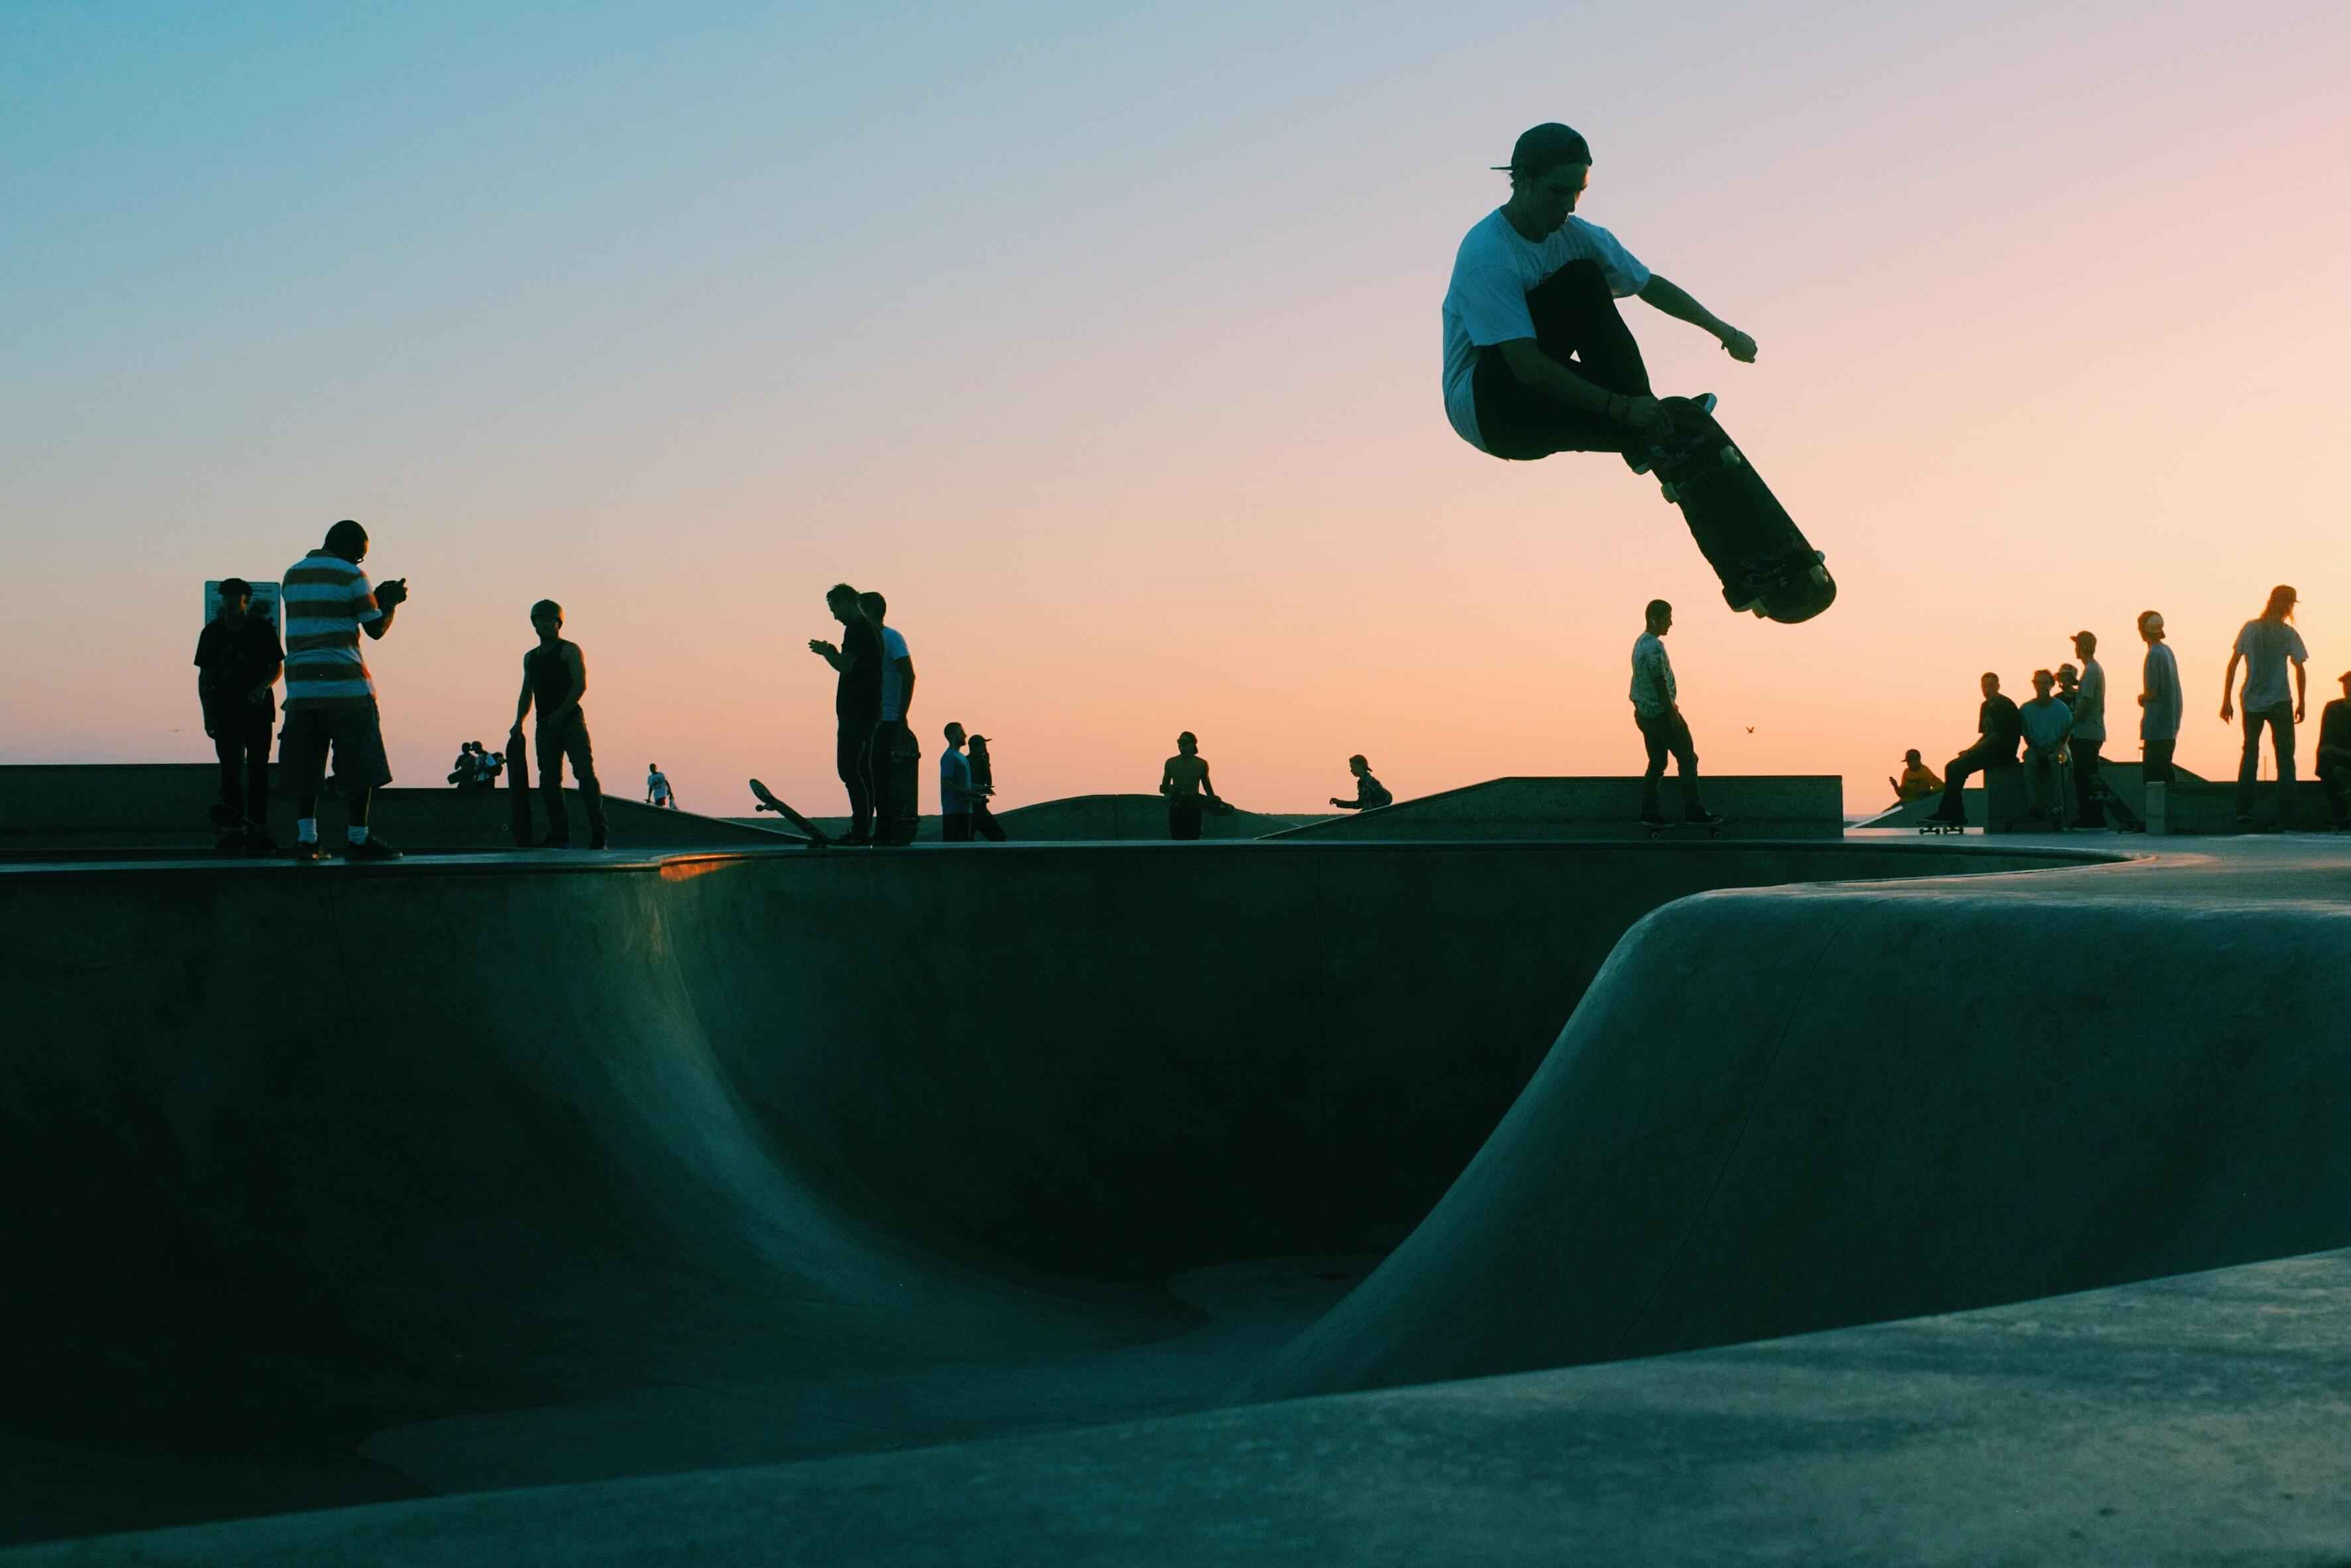 5403726 3548x2367 skate PNG images man skateboard venice 3548x2367